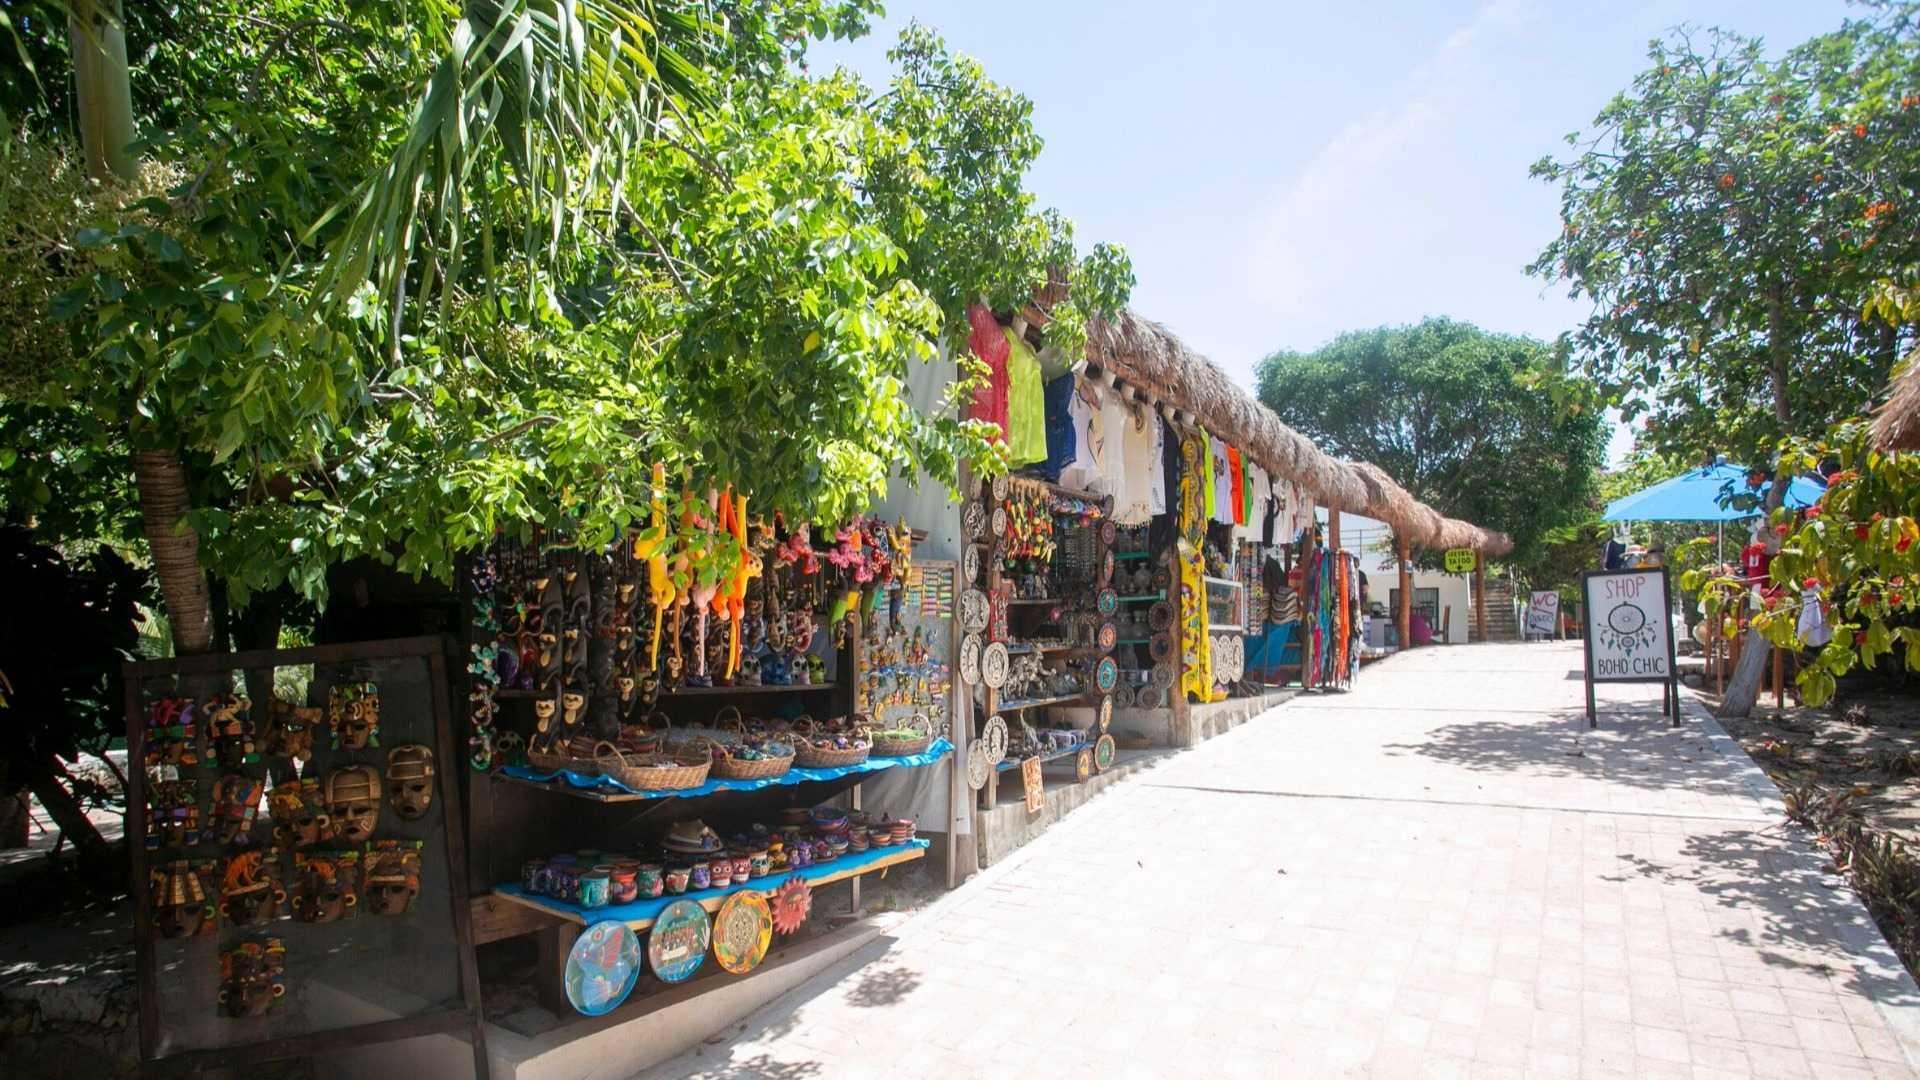 03 - Beach club - Playa Mexico - Ice Bar Isla Mujeres - Shopping